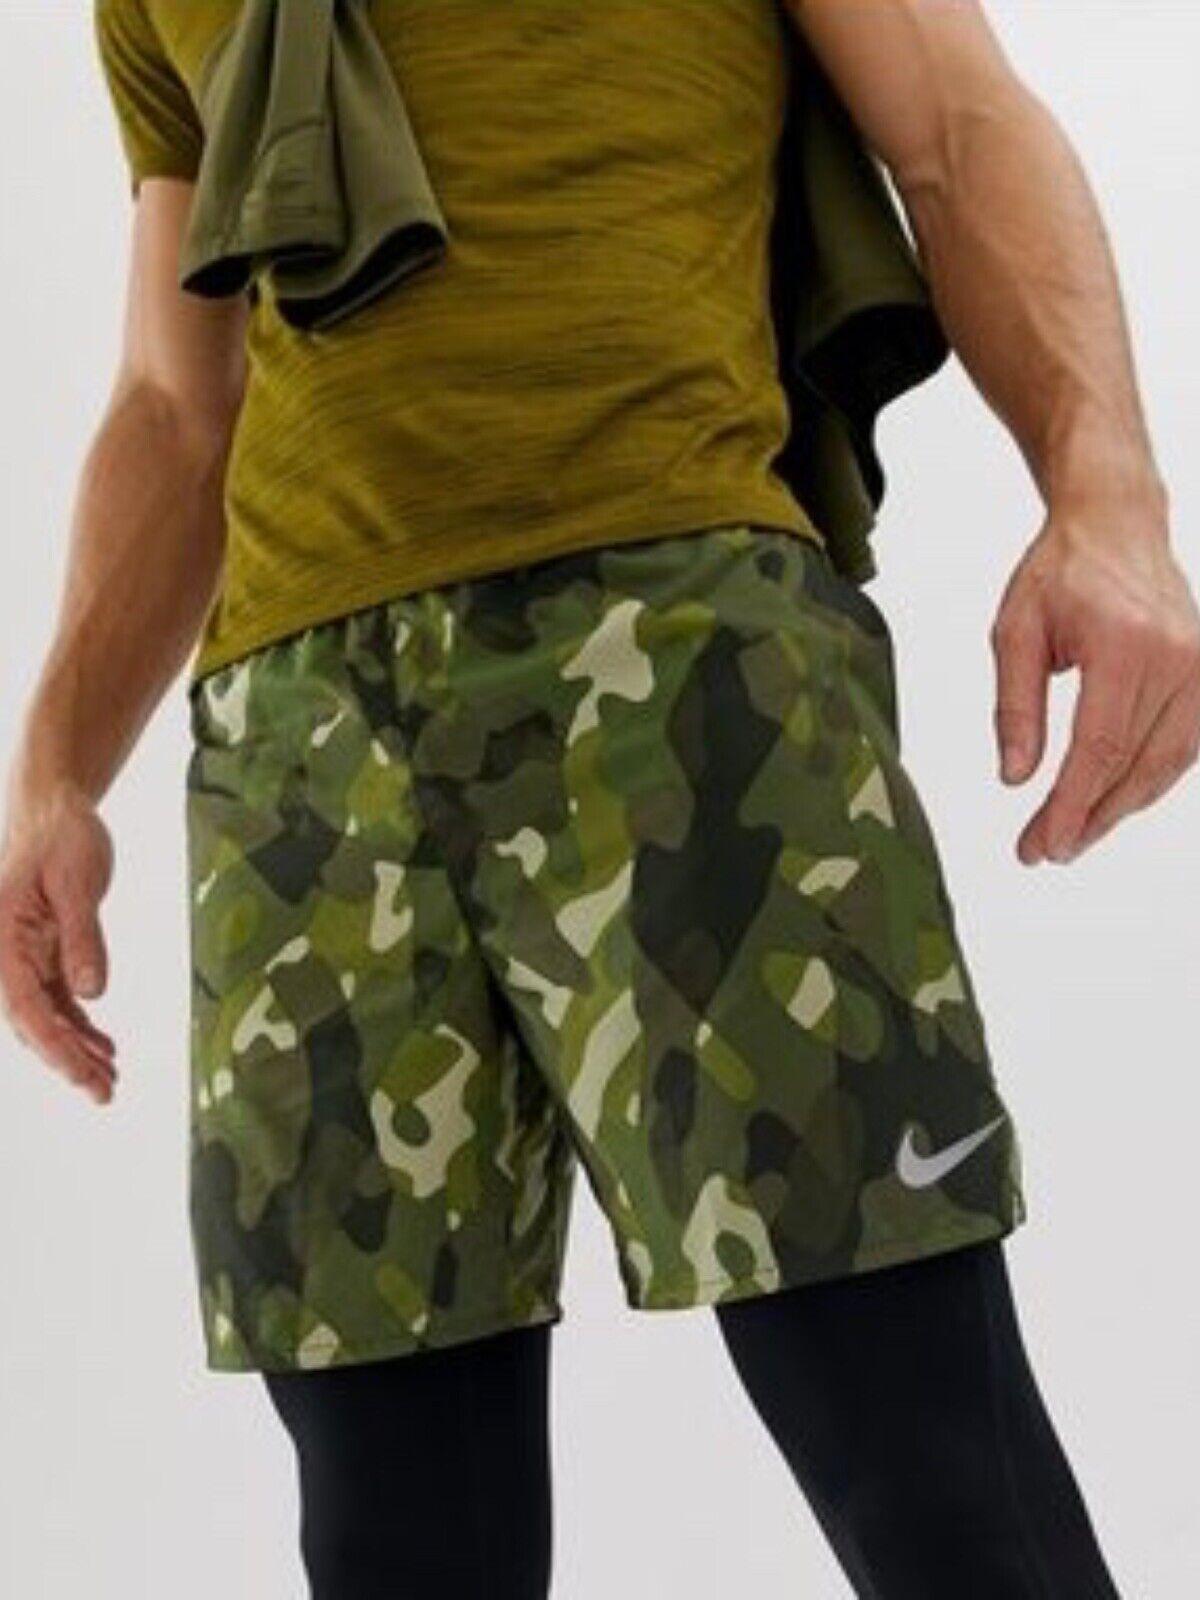 Nike Camo-laufshort para caballeros  (aprox. 18 cm) nike distance talla L  descuento de bajo precio